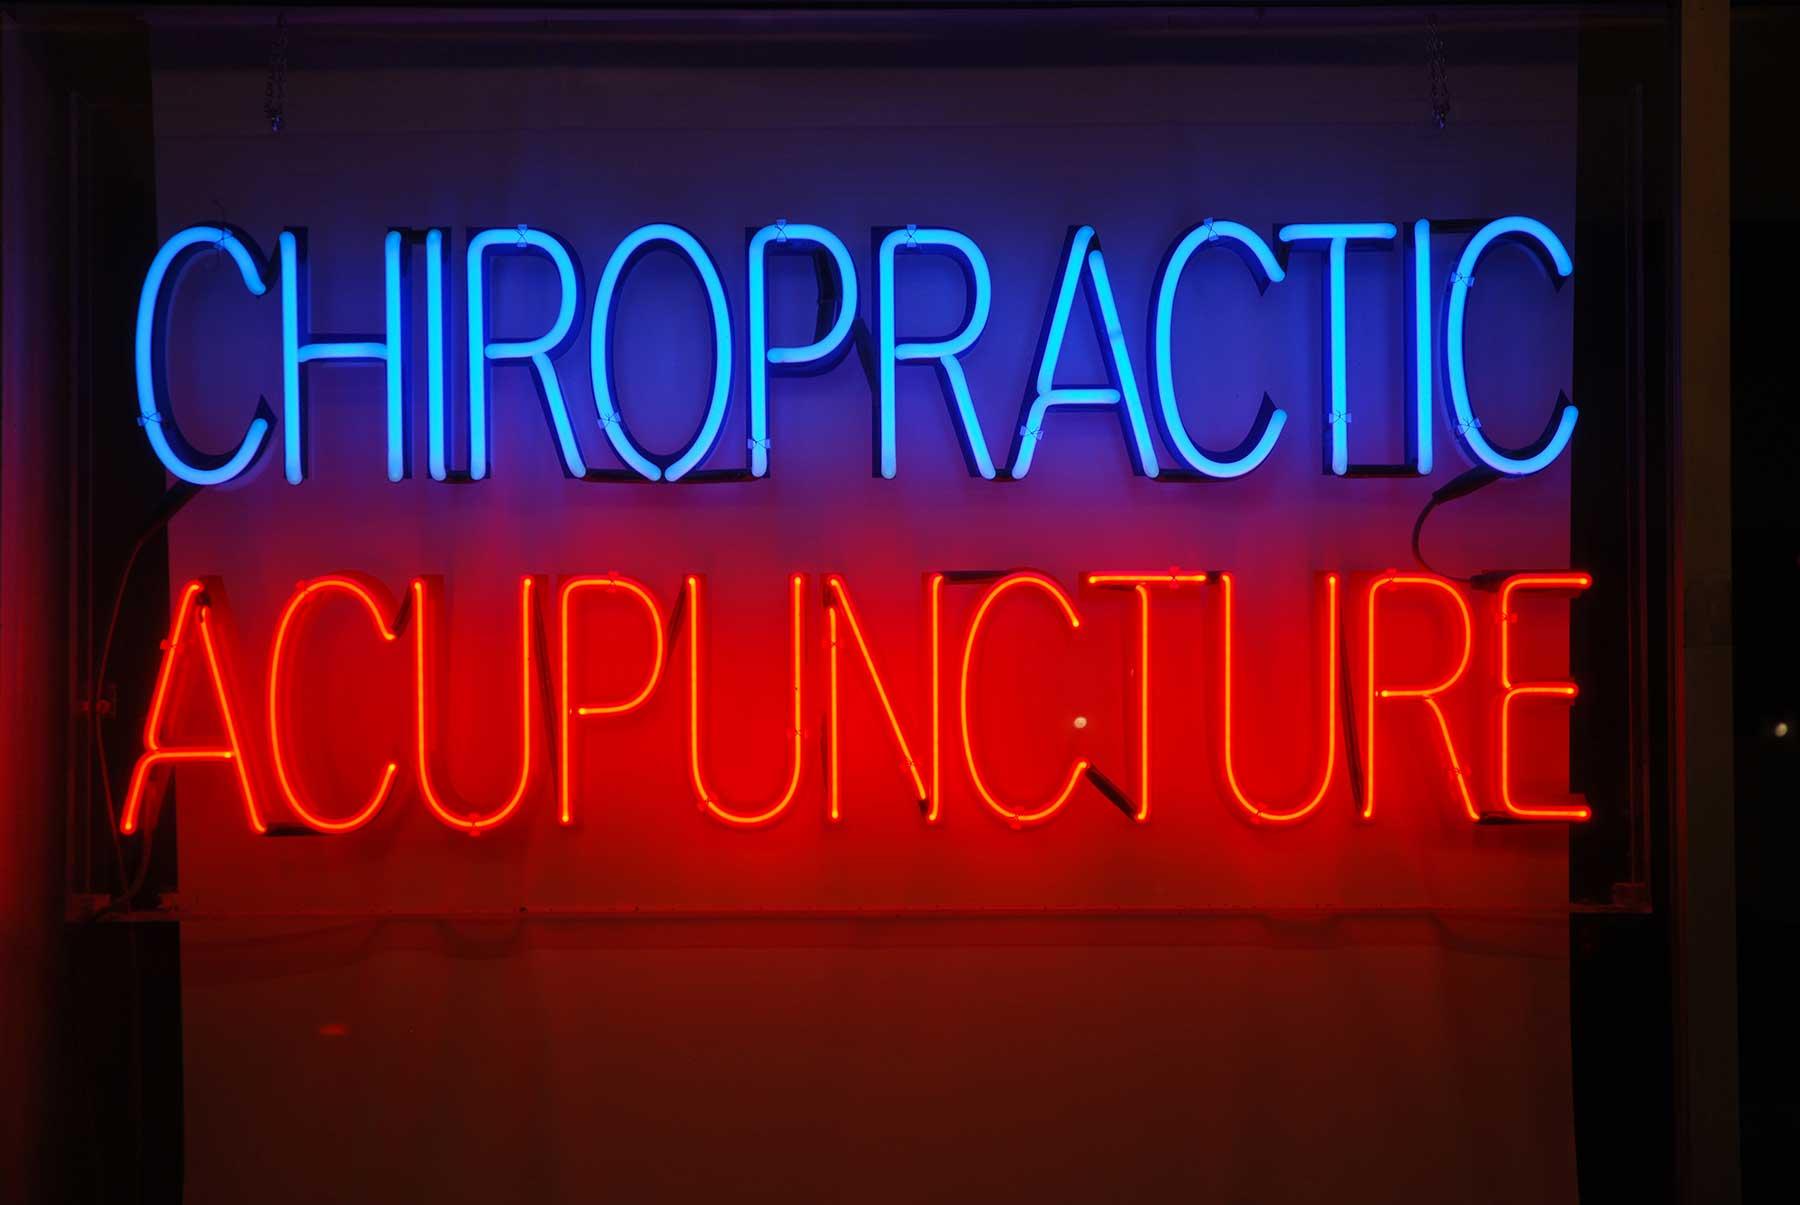 acupunture-chiropractornorthvancouver